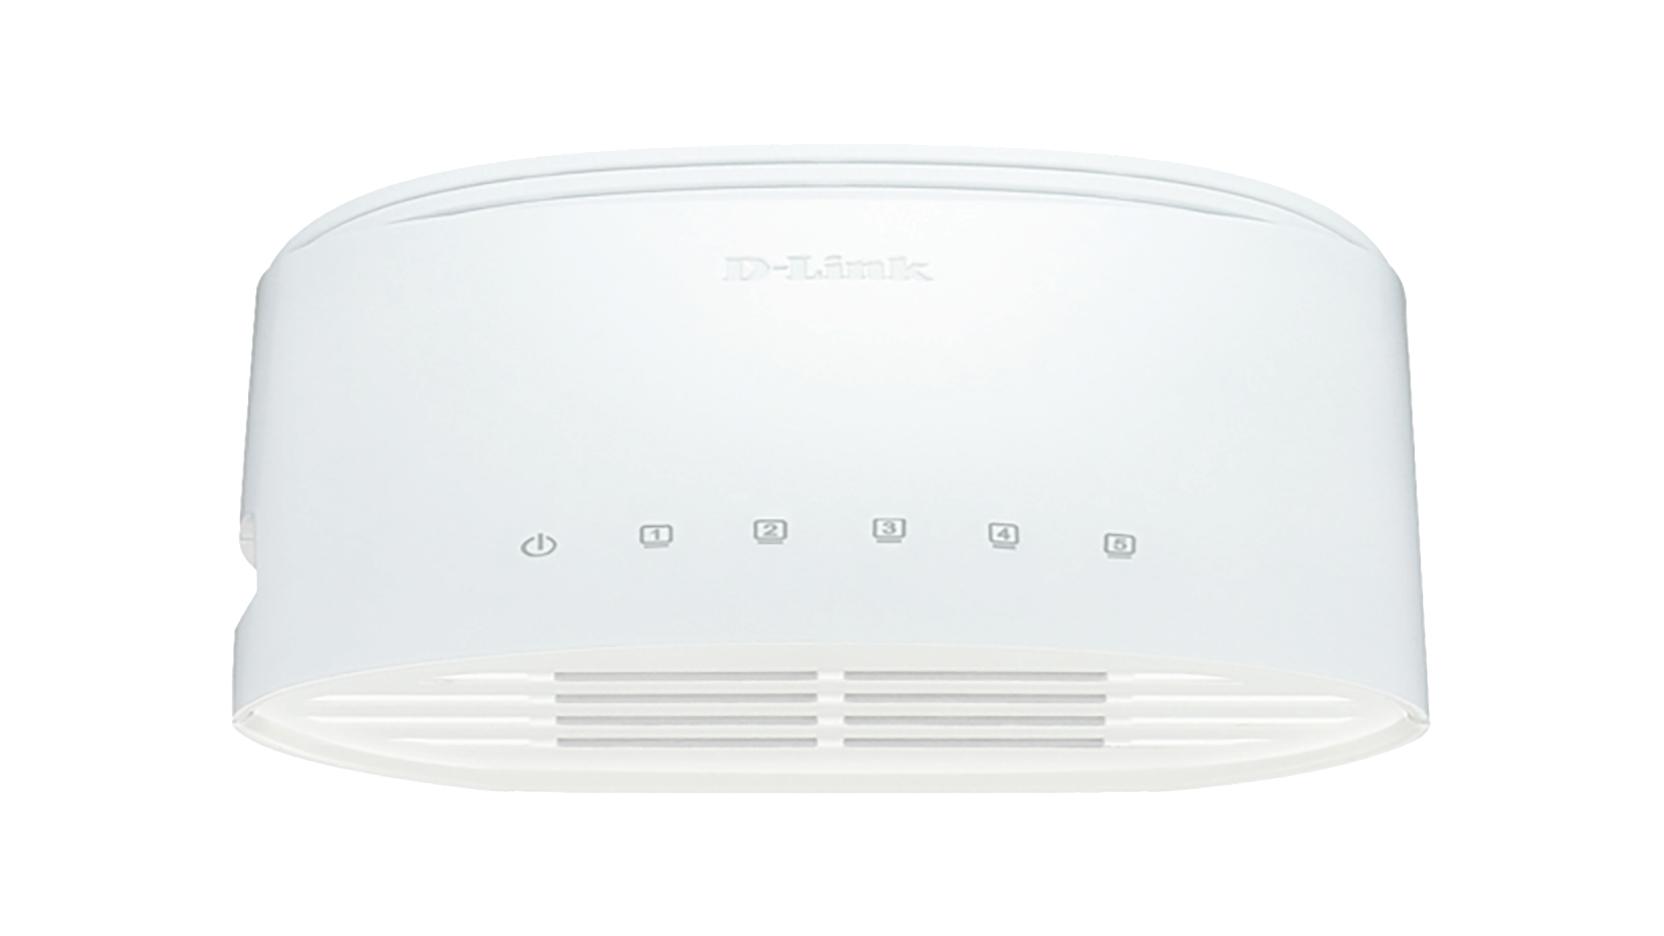 D-Link DGS-1005D/E switch No administrado L2 Gigabit Ethernet (10/100/1000) Blanco